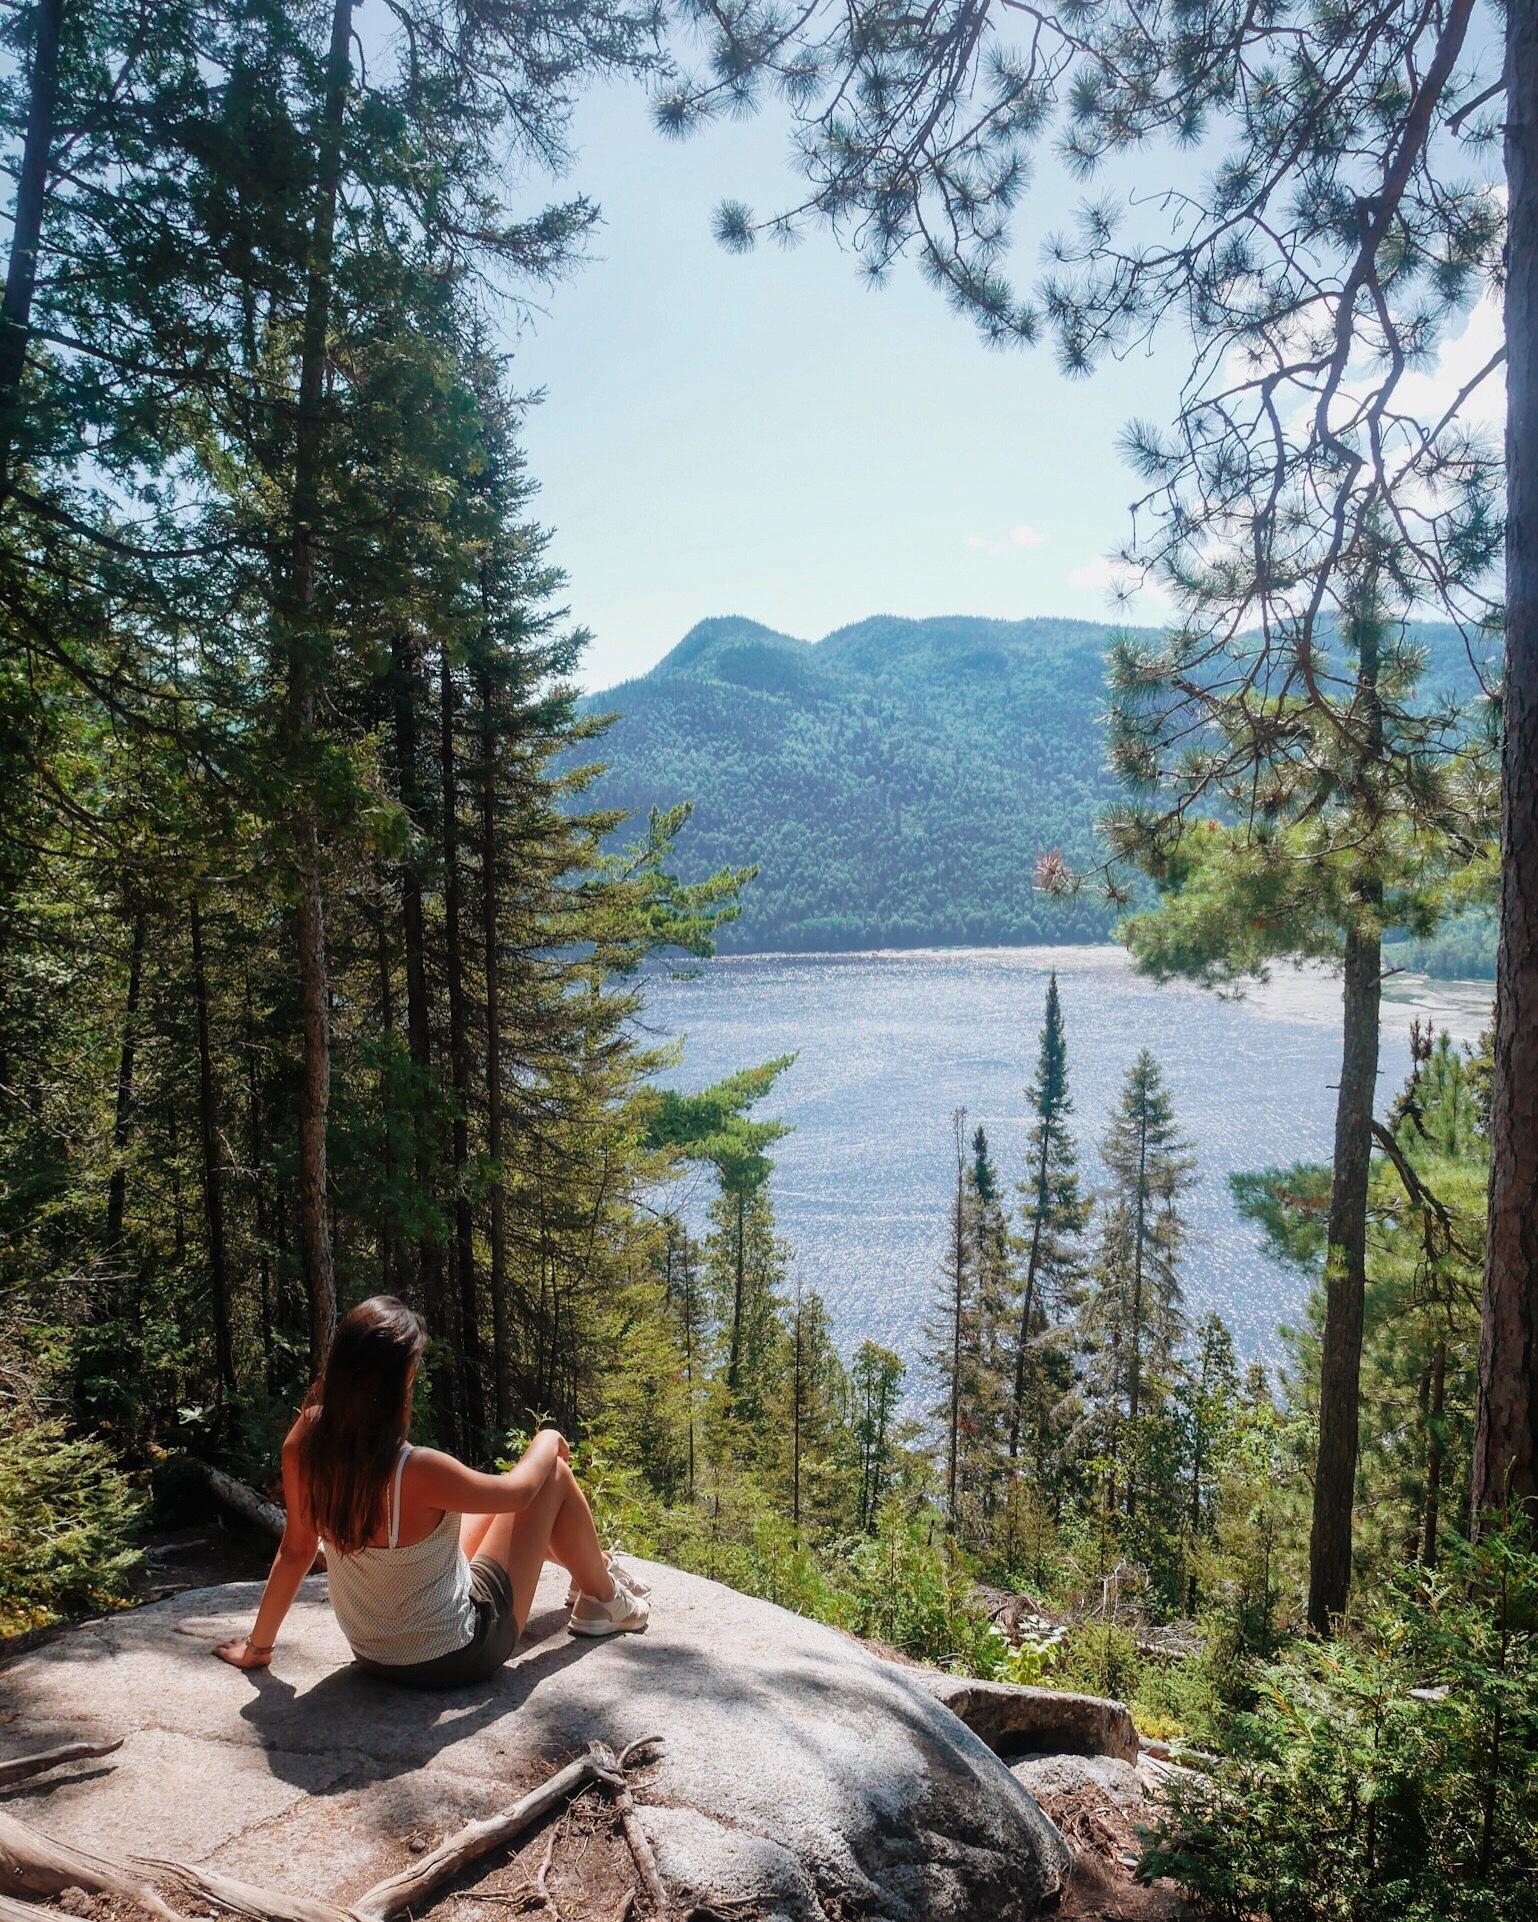 Fjord de Saguenay - Roadtrip au Québec, Canada - Blog Voyage Ma Folie Vabaonde